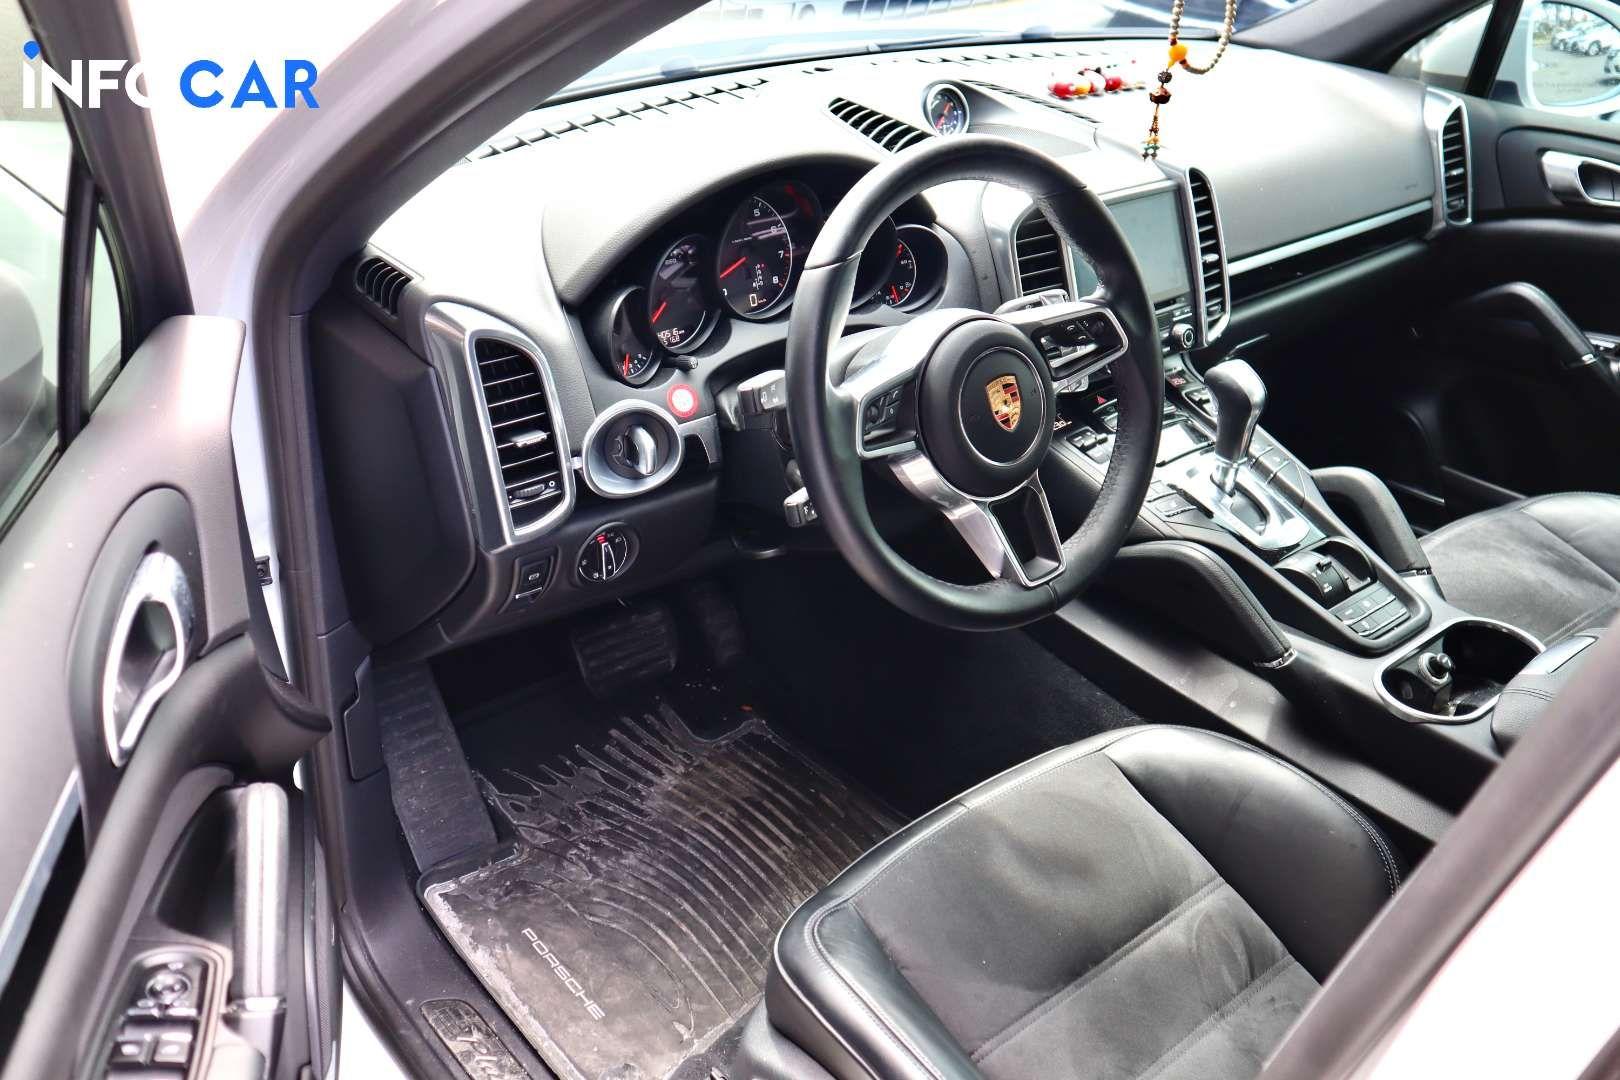 2018 Porsche Cayenne Platinum Edition - INFOCAR - Toronto's Most Comprehensive New and Used Auto Trading Platform